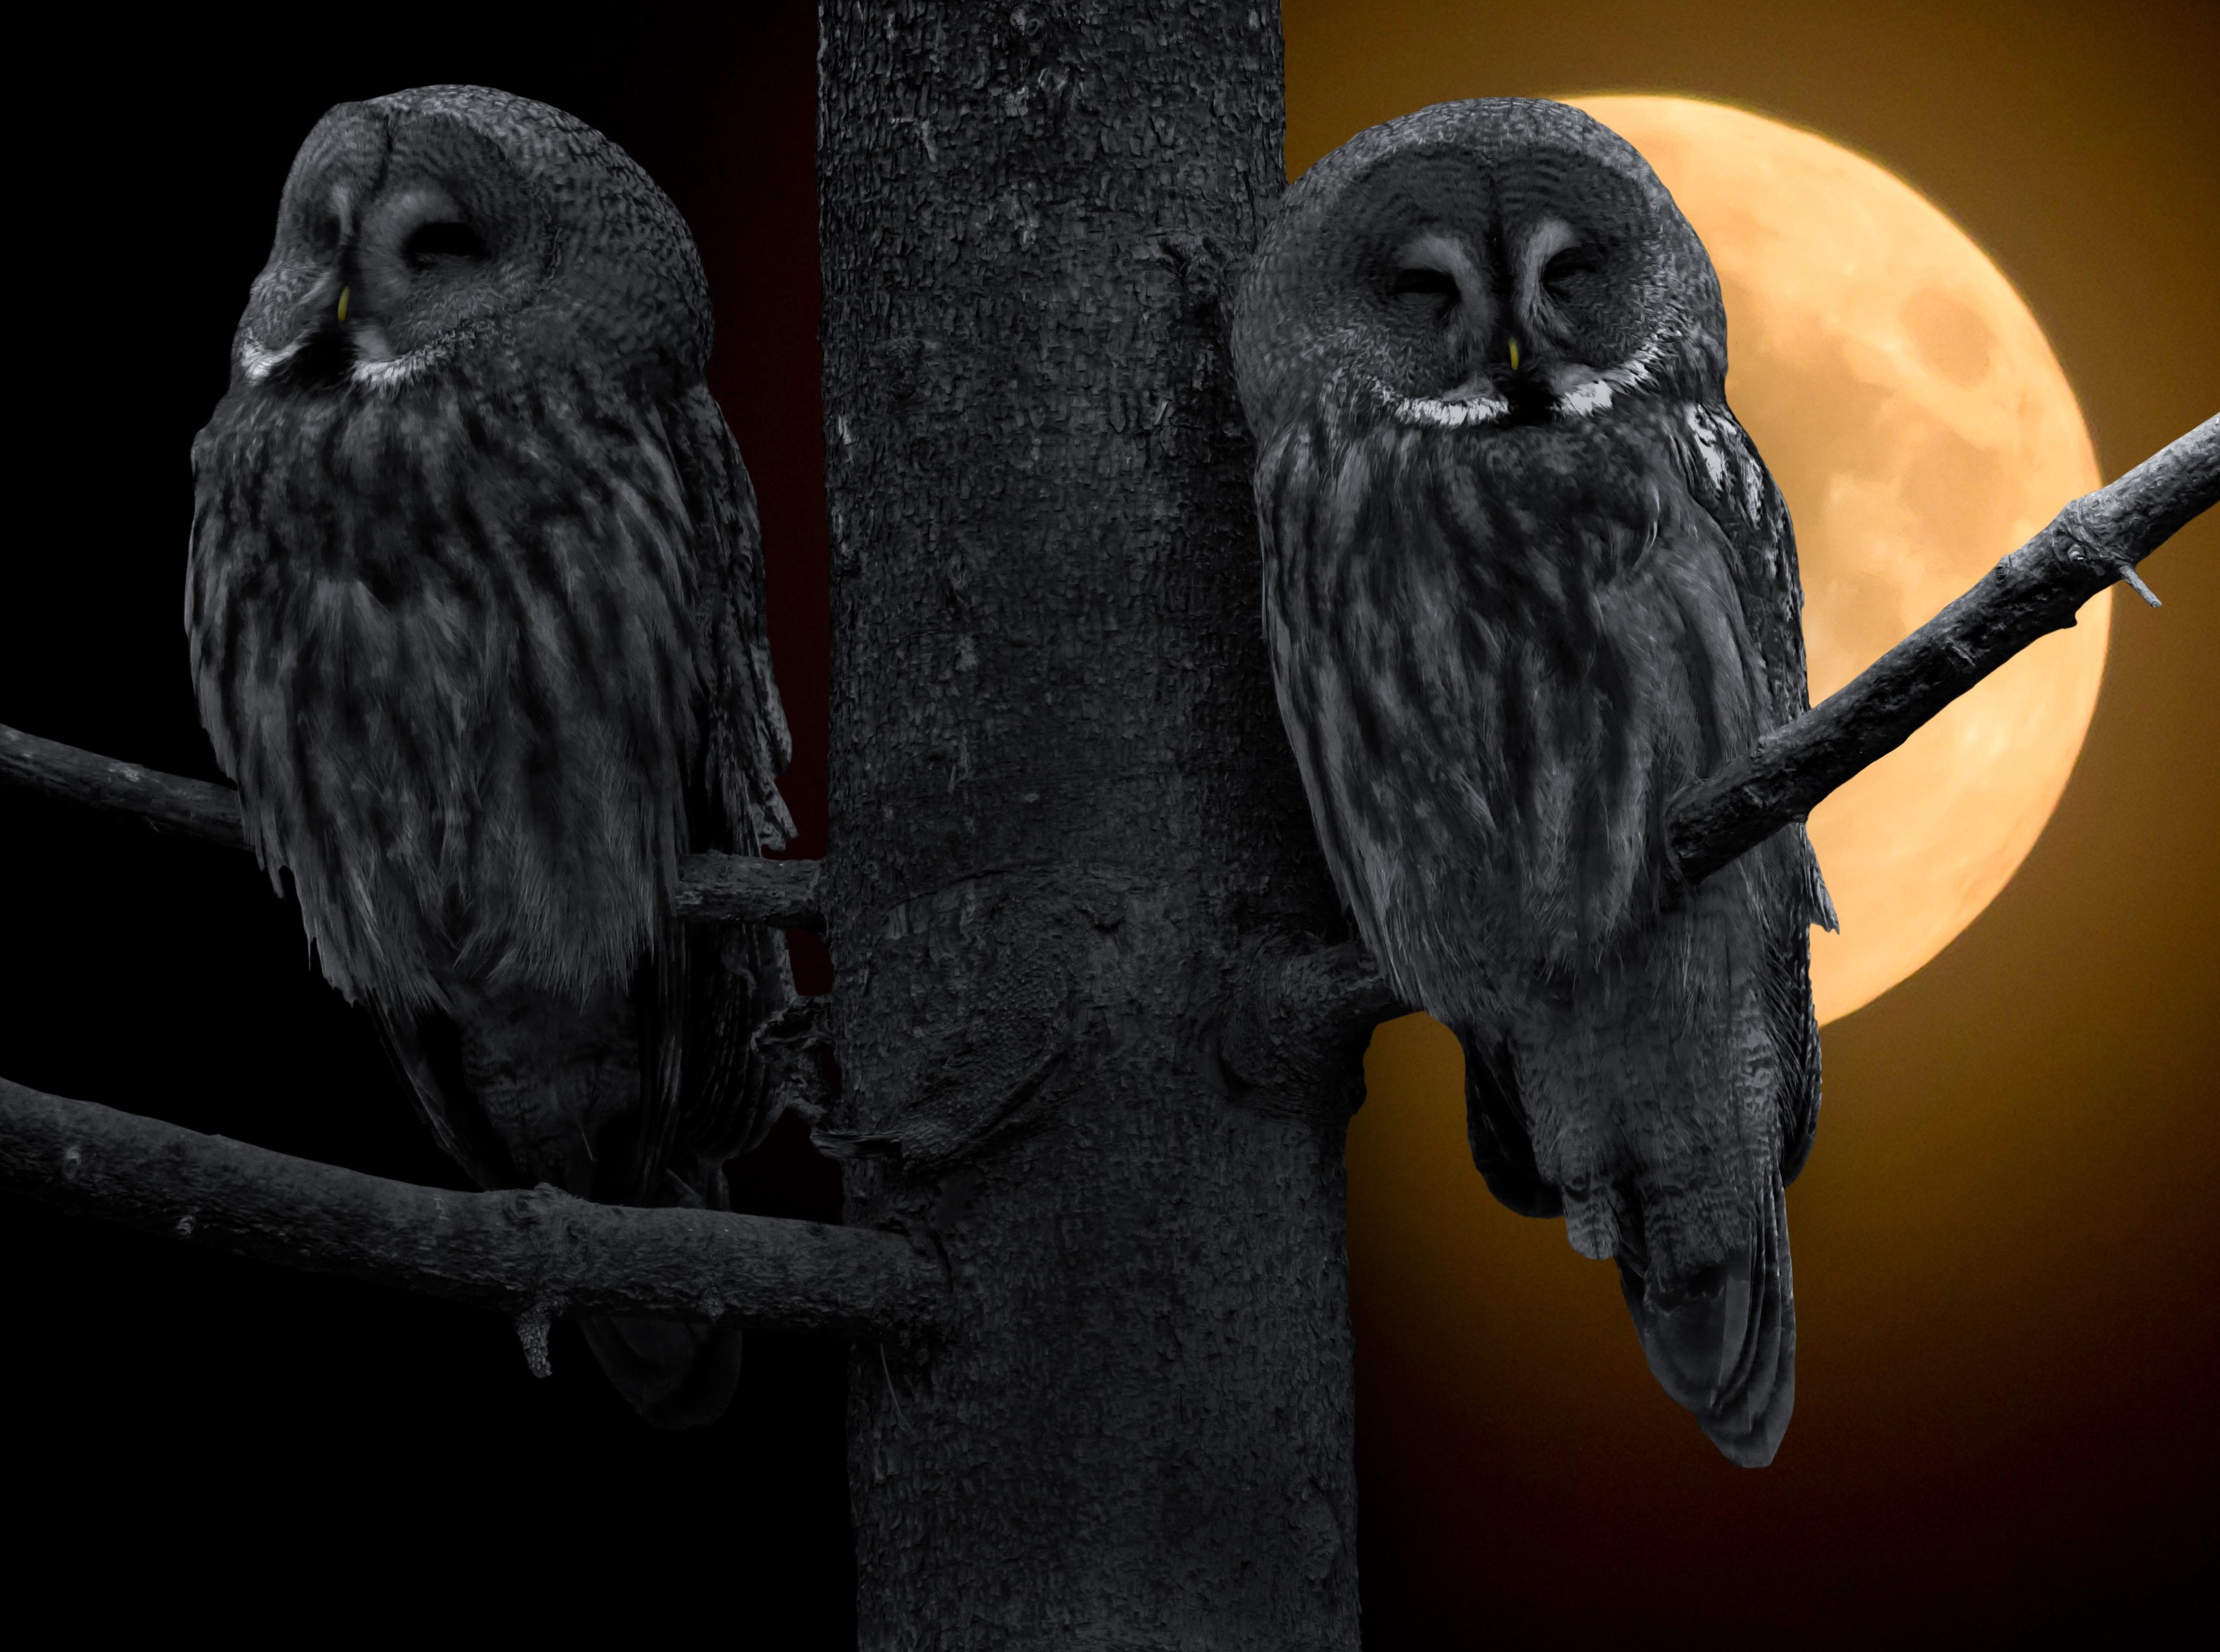 Owls on the tree photo